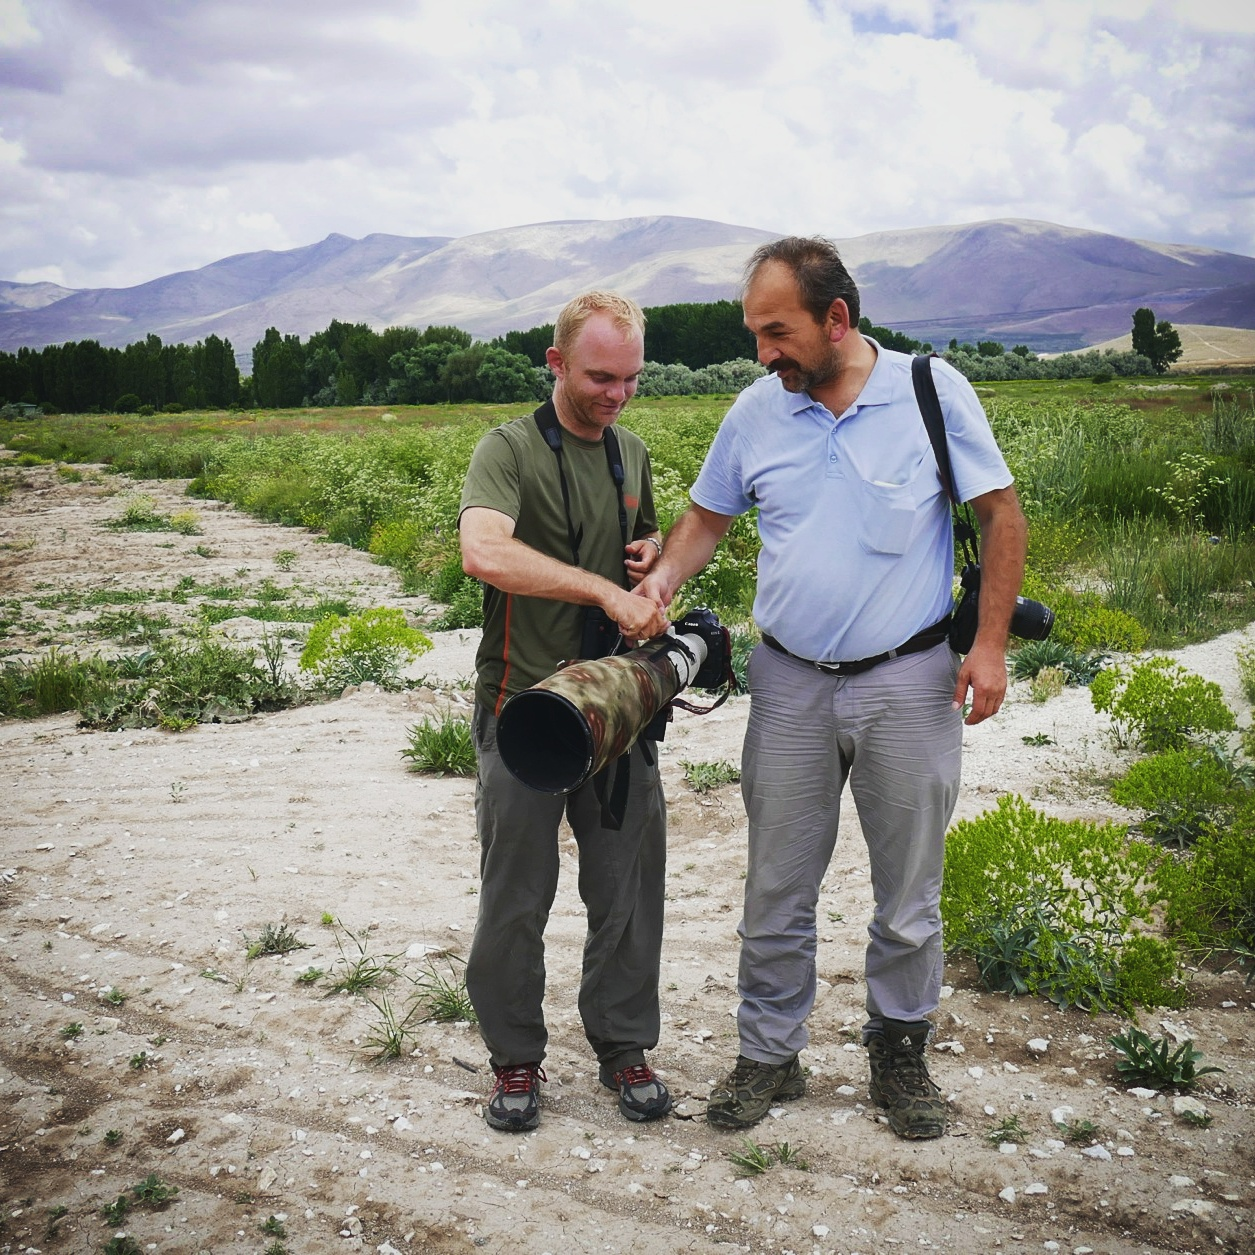 Ahmet (right) shows Noah the weight of his camera lens. Noah Strycker